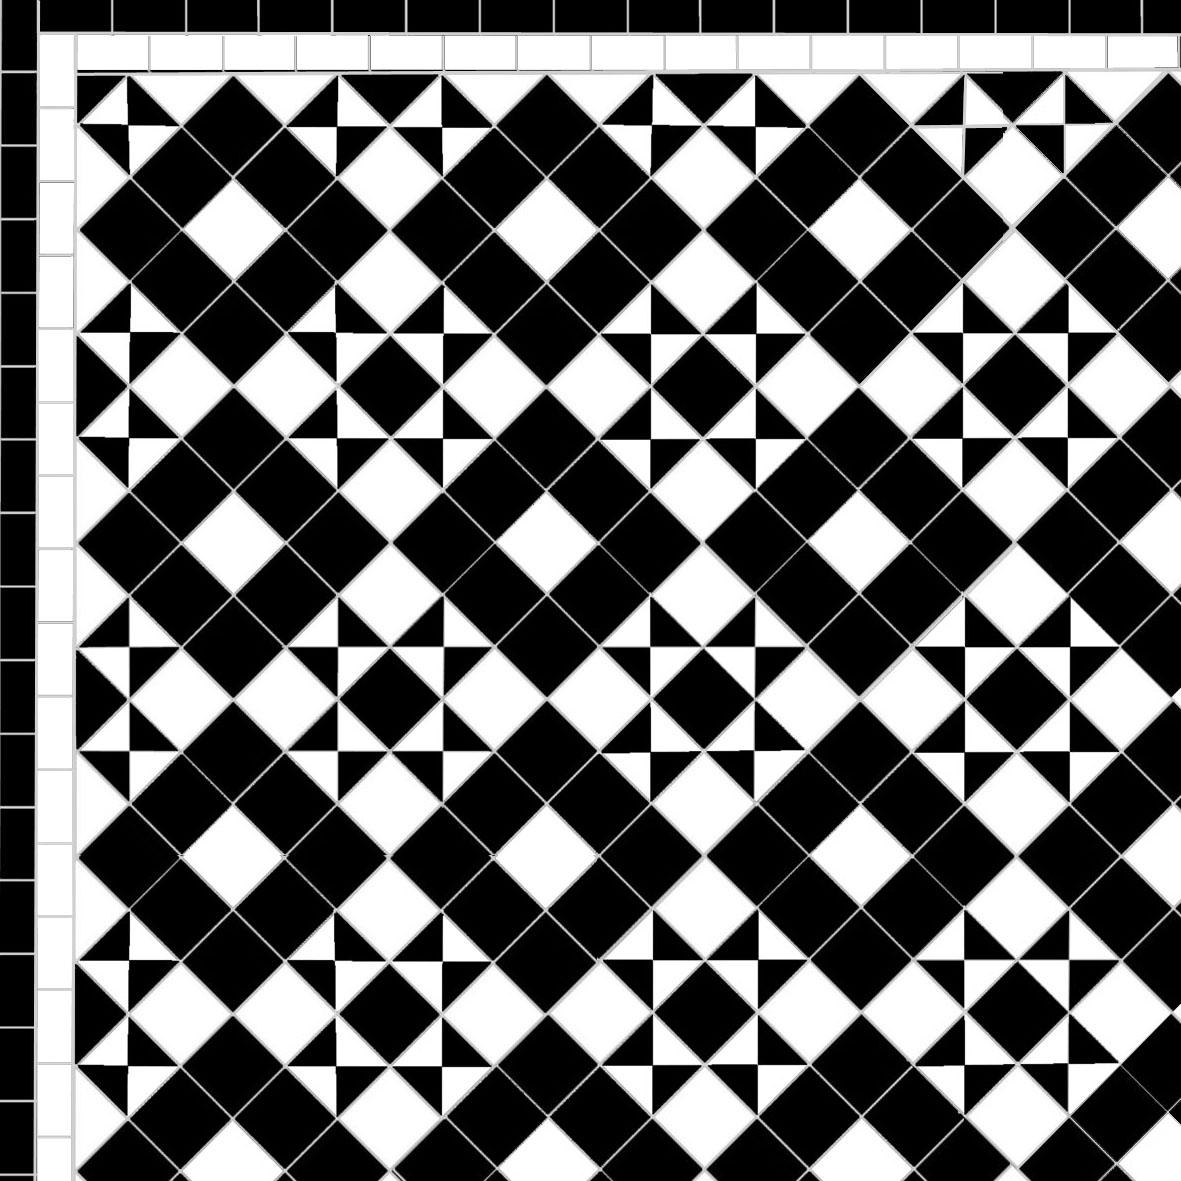 Dark Box & Star - Single Line - black